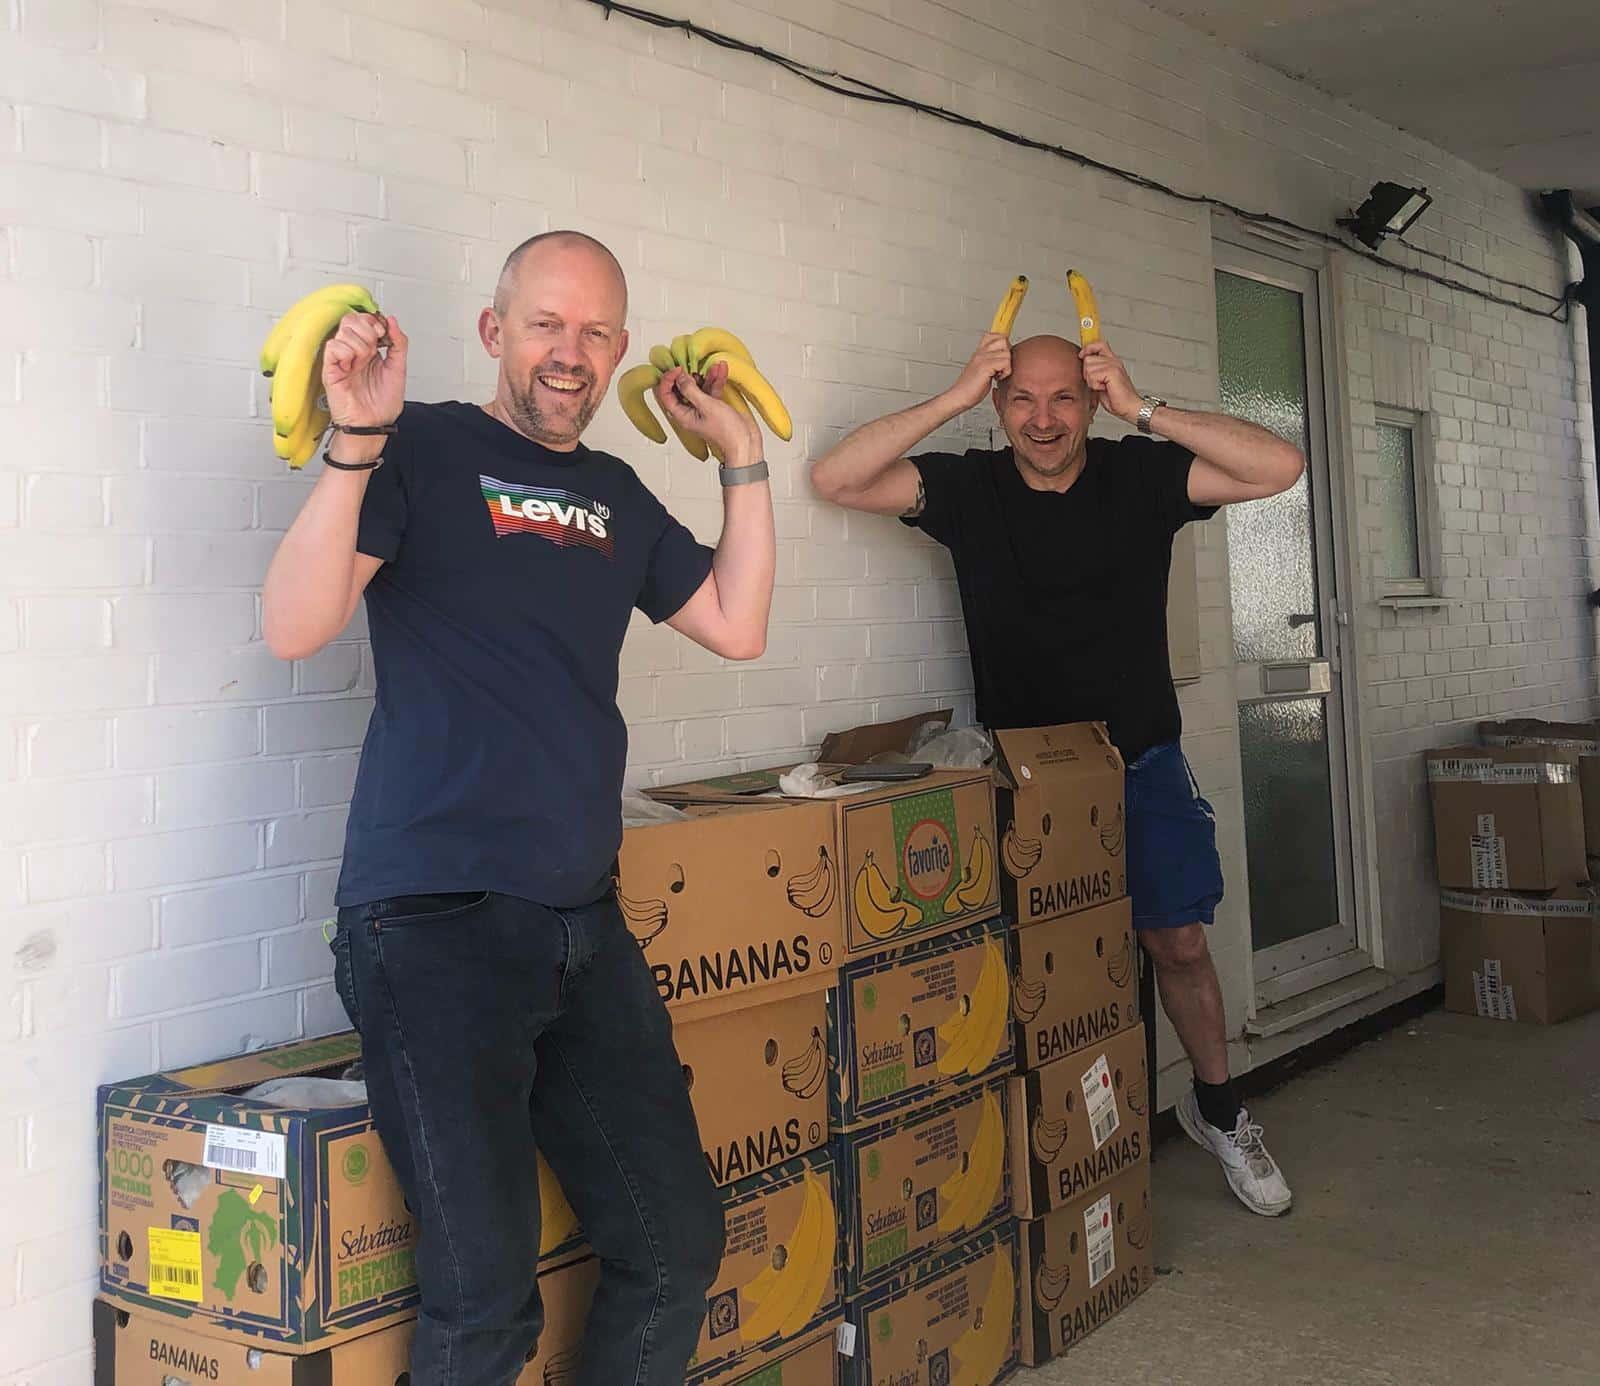 Lots of bananas to give away